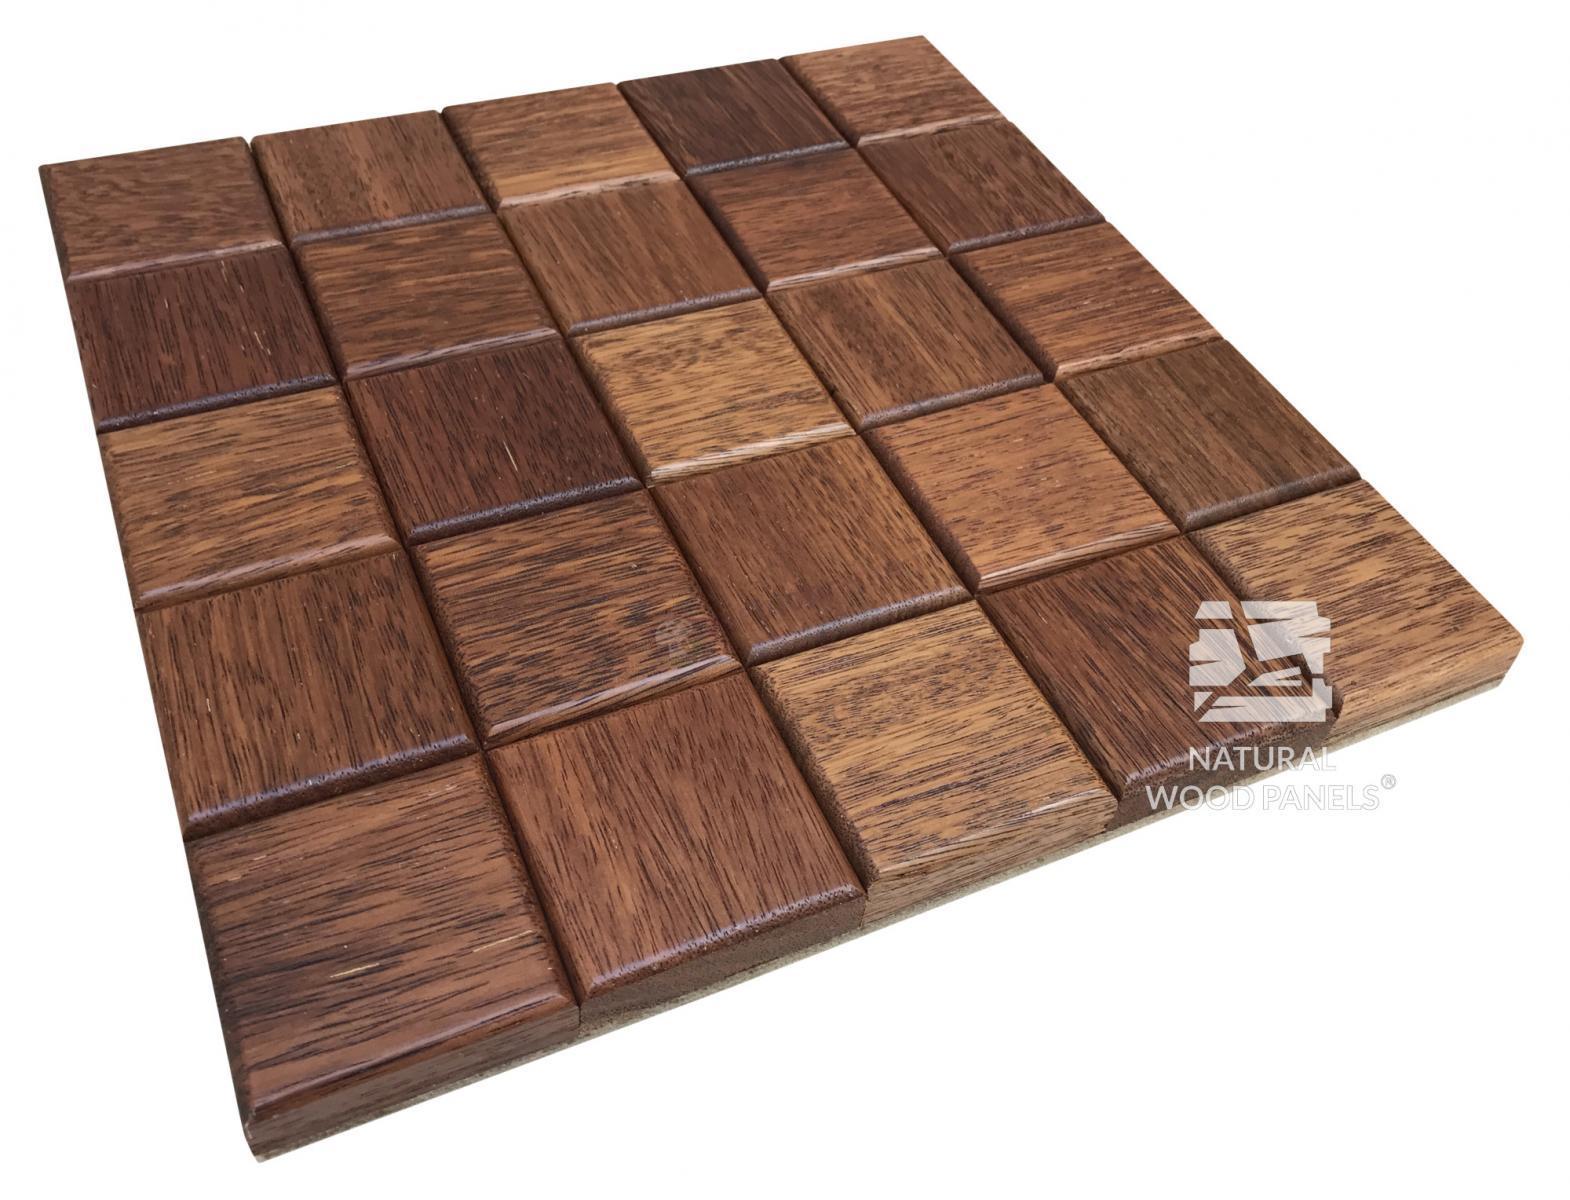 Panele CHOCO LUXURY series – Merbau Natural Wood Panels